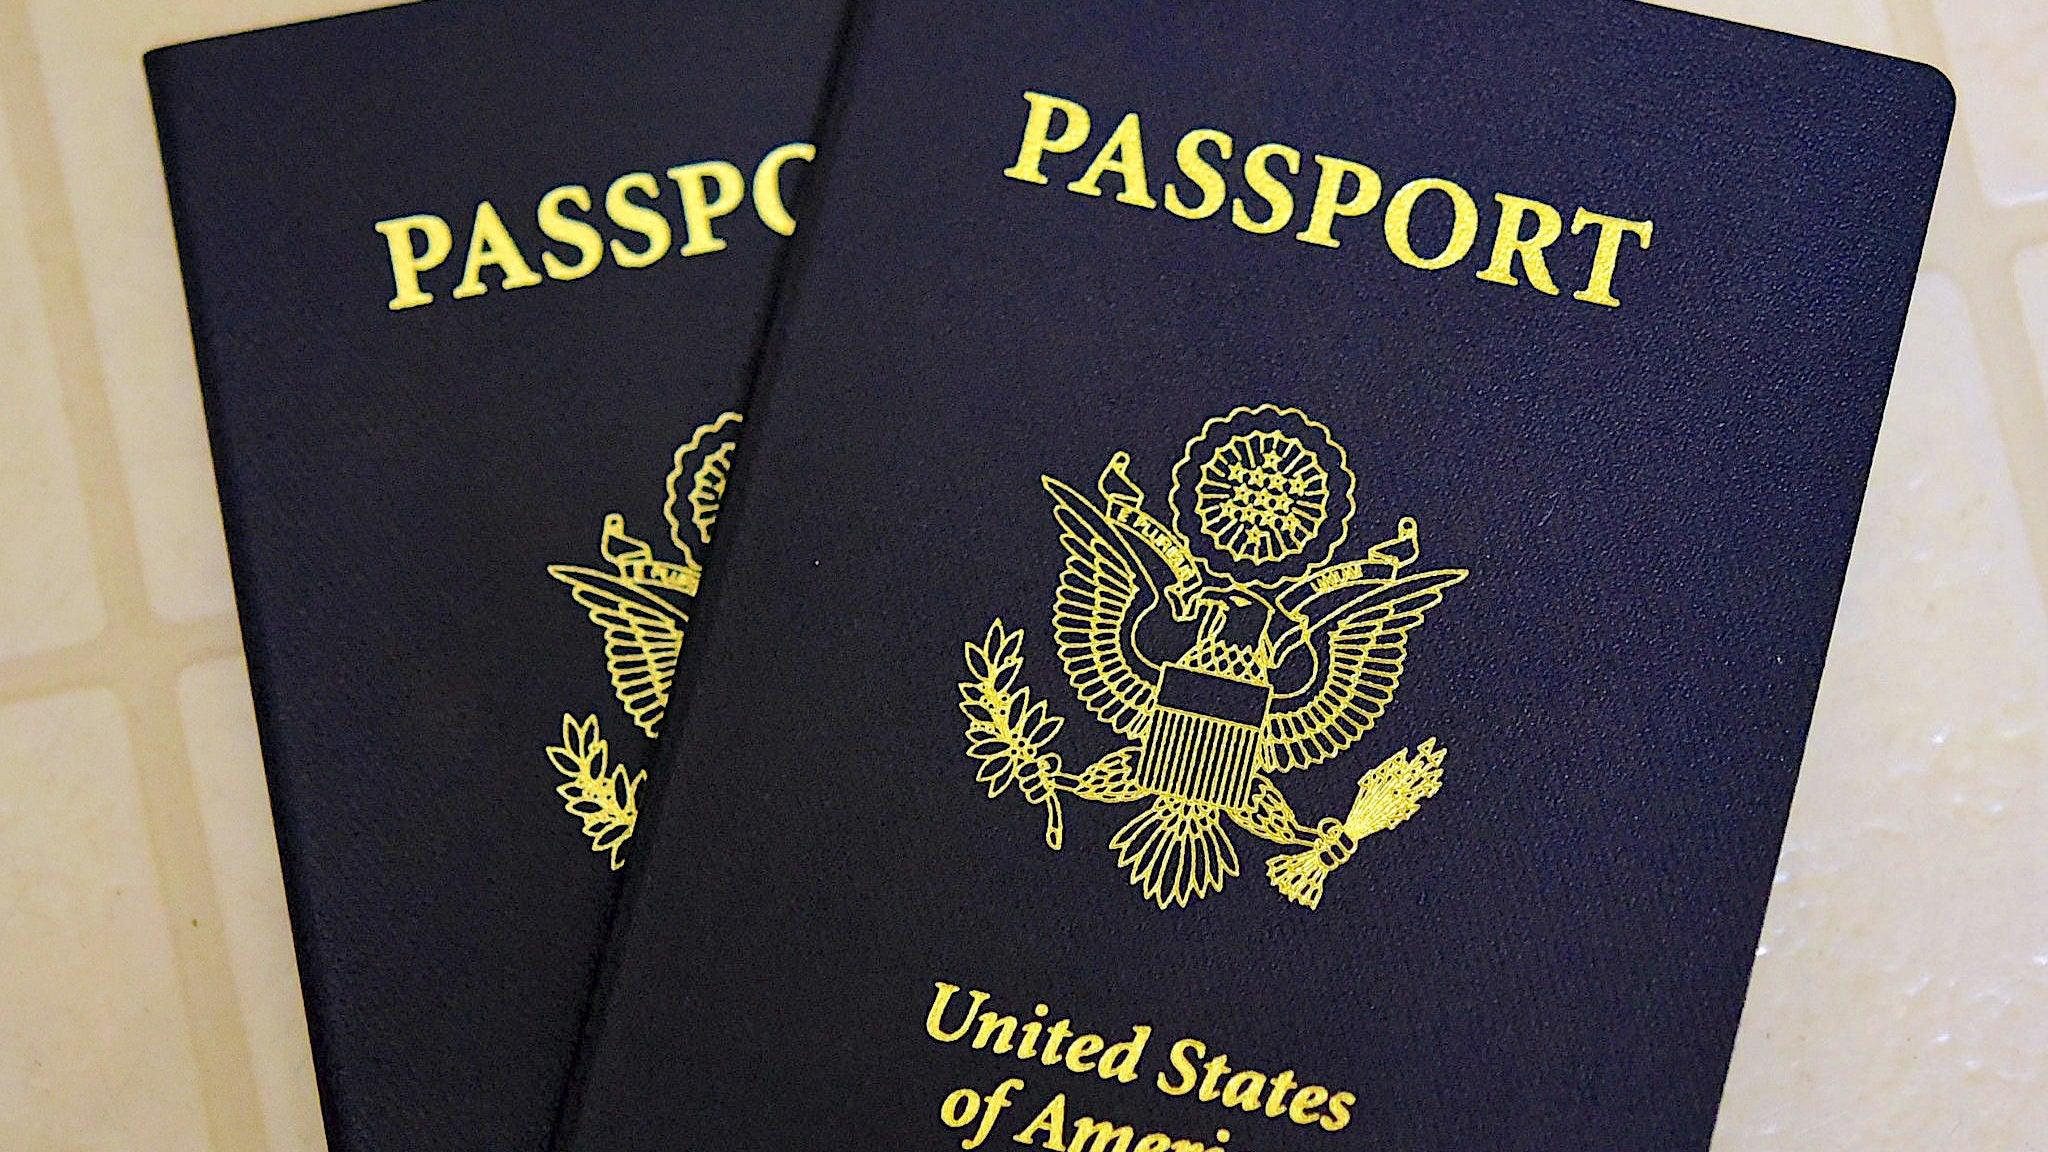 Passport dsMGqqOH3y